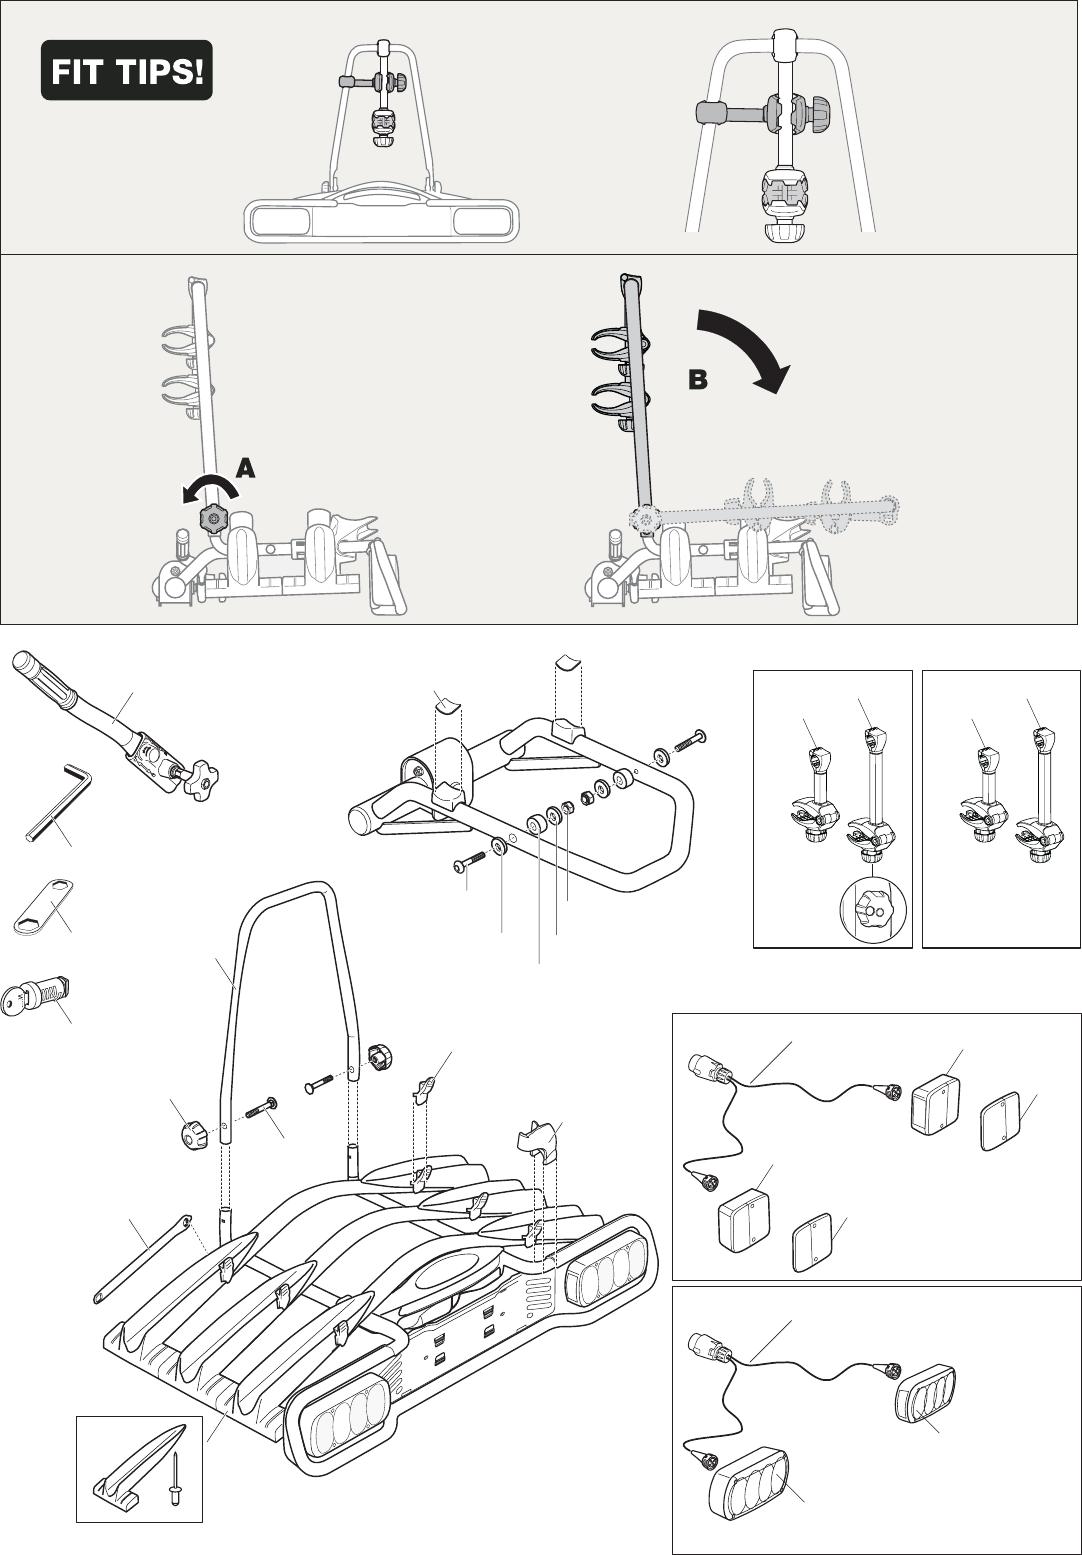 handleiding thule euroway 945 pagina 15 van 16 deutsch. Black Bedroom Furniture Sets. Home Design Ideas